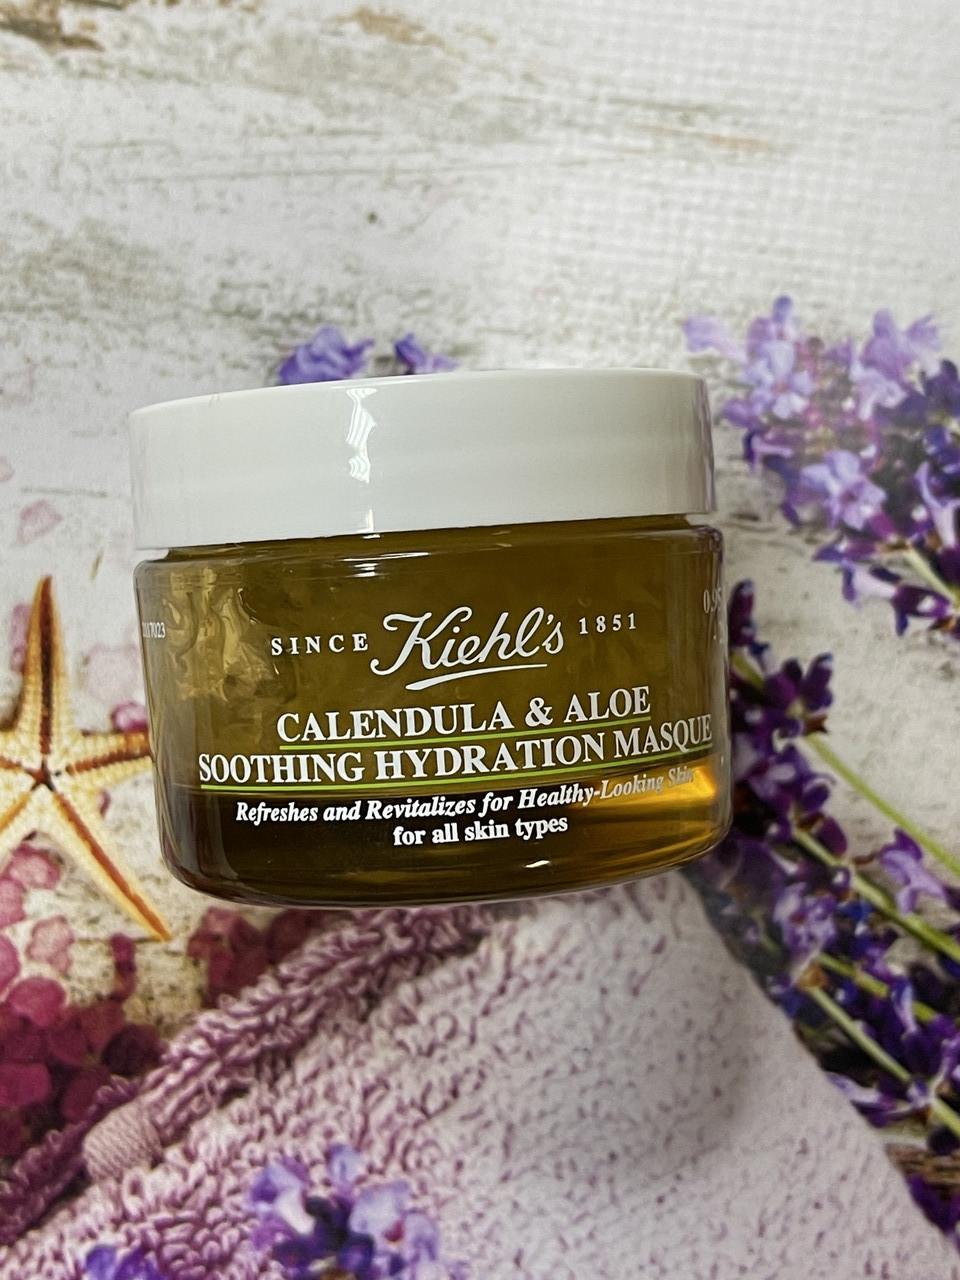 Увлажняющая маска с календулой и алоэ для лица Kiehl's Calendula & aloe soothing hydration masque